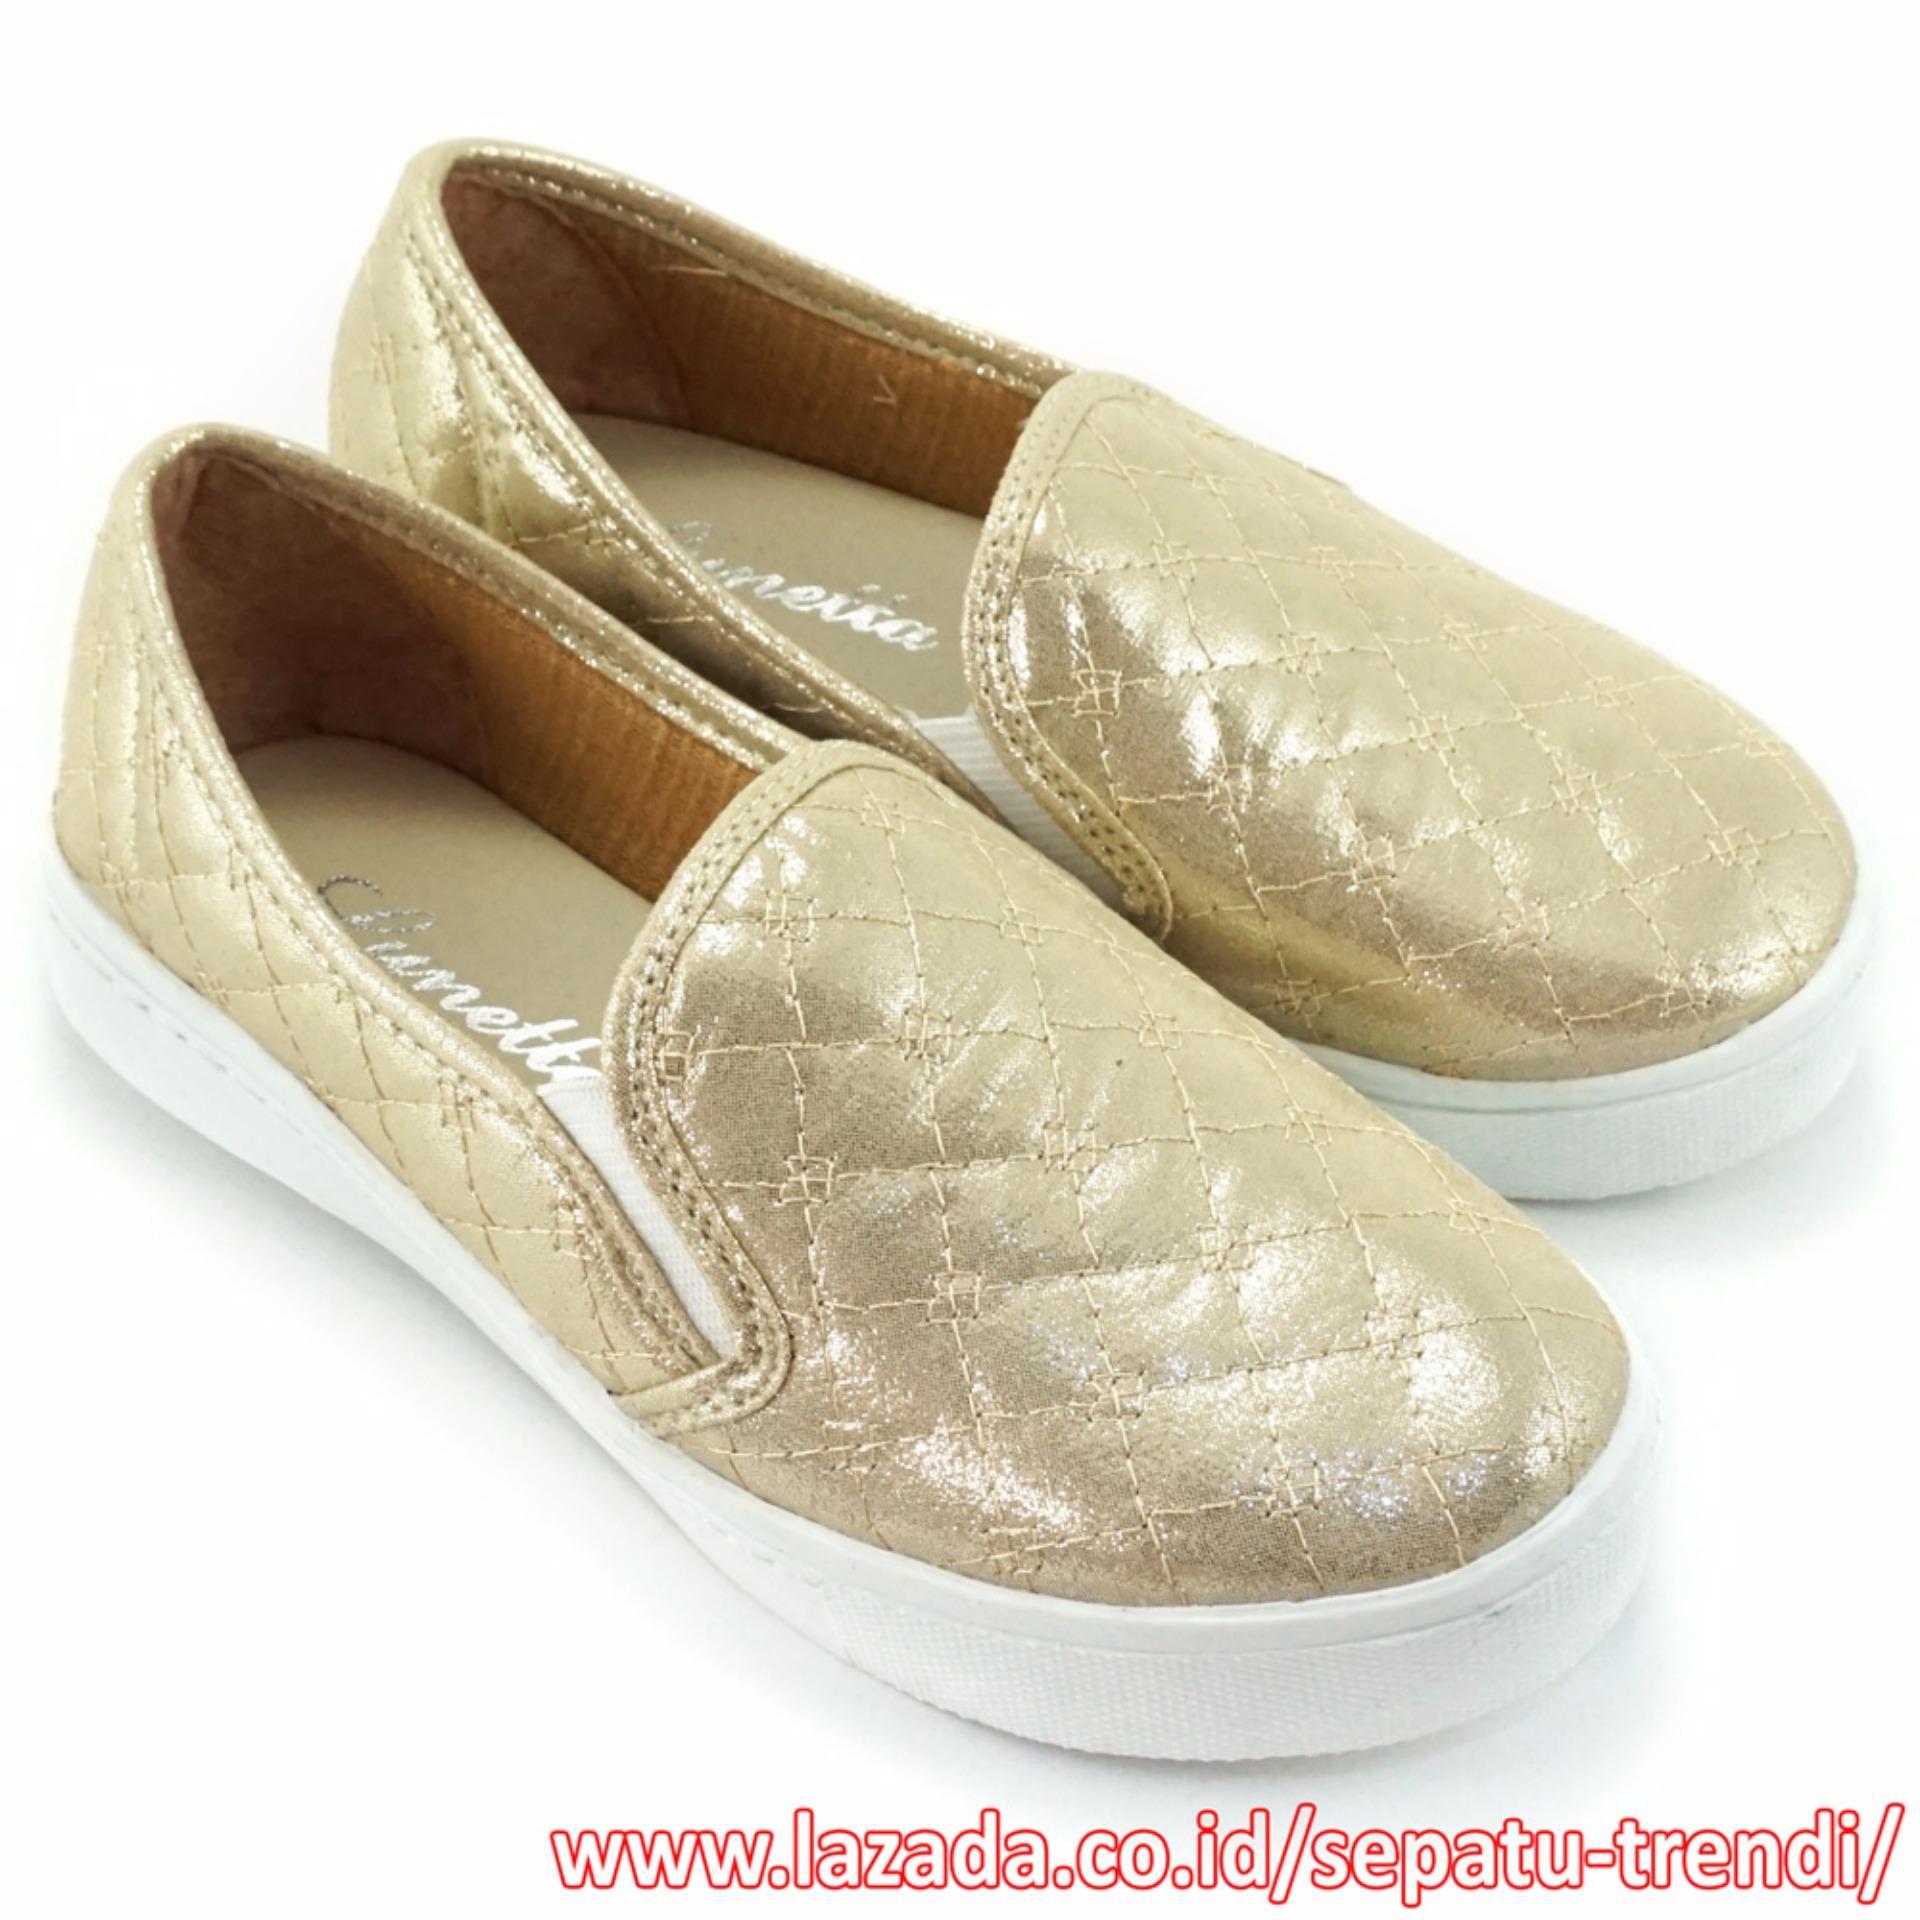 Spek Lunetta Sepatu Anak Perempuan Slip On Luxe Fcl Emas Lunetta